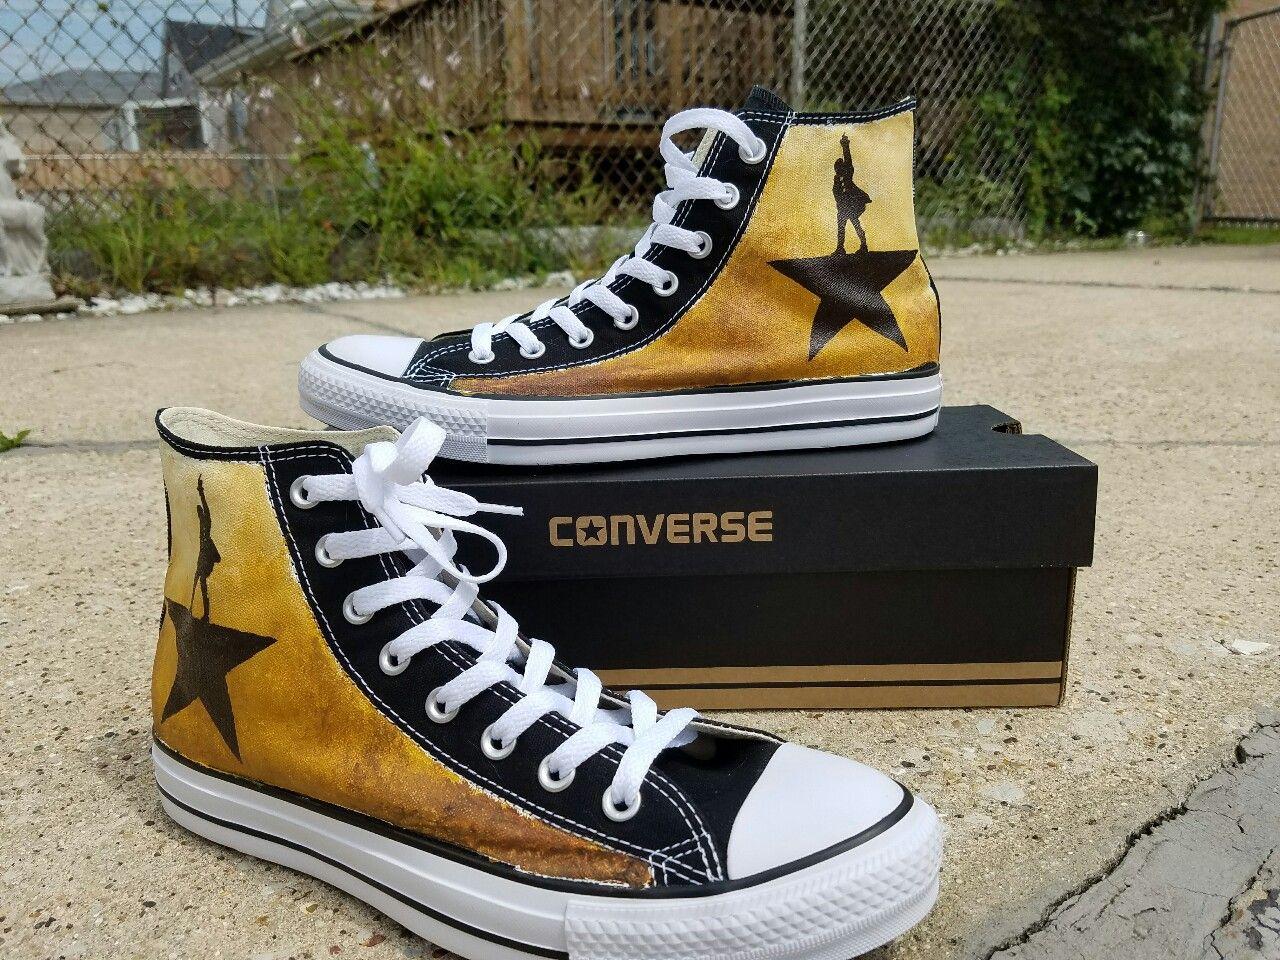 Converse All Star Chucks UK 5 UE 375 Nirvana Kurt cobaine Limited Edition RARE